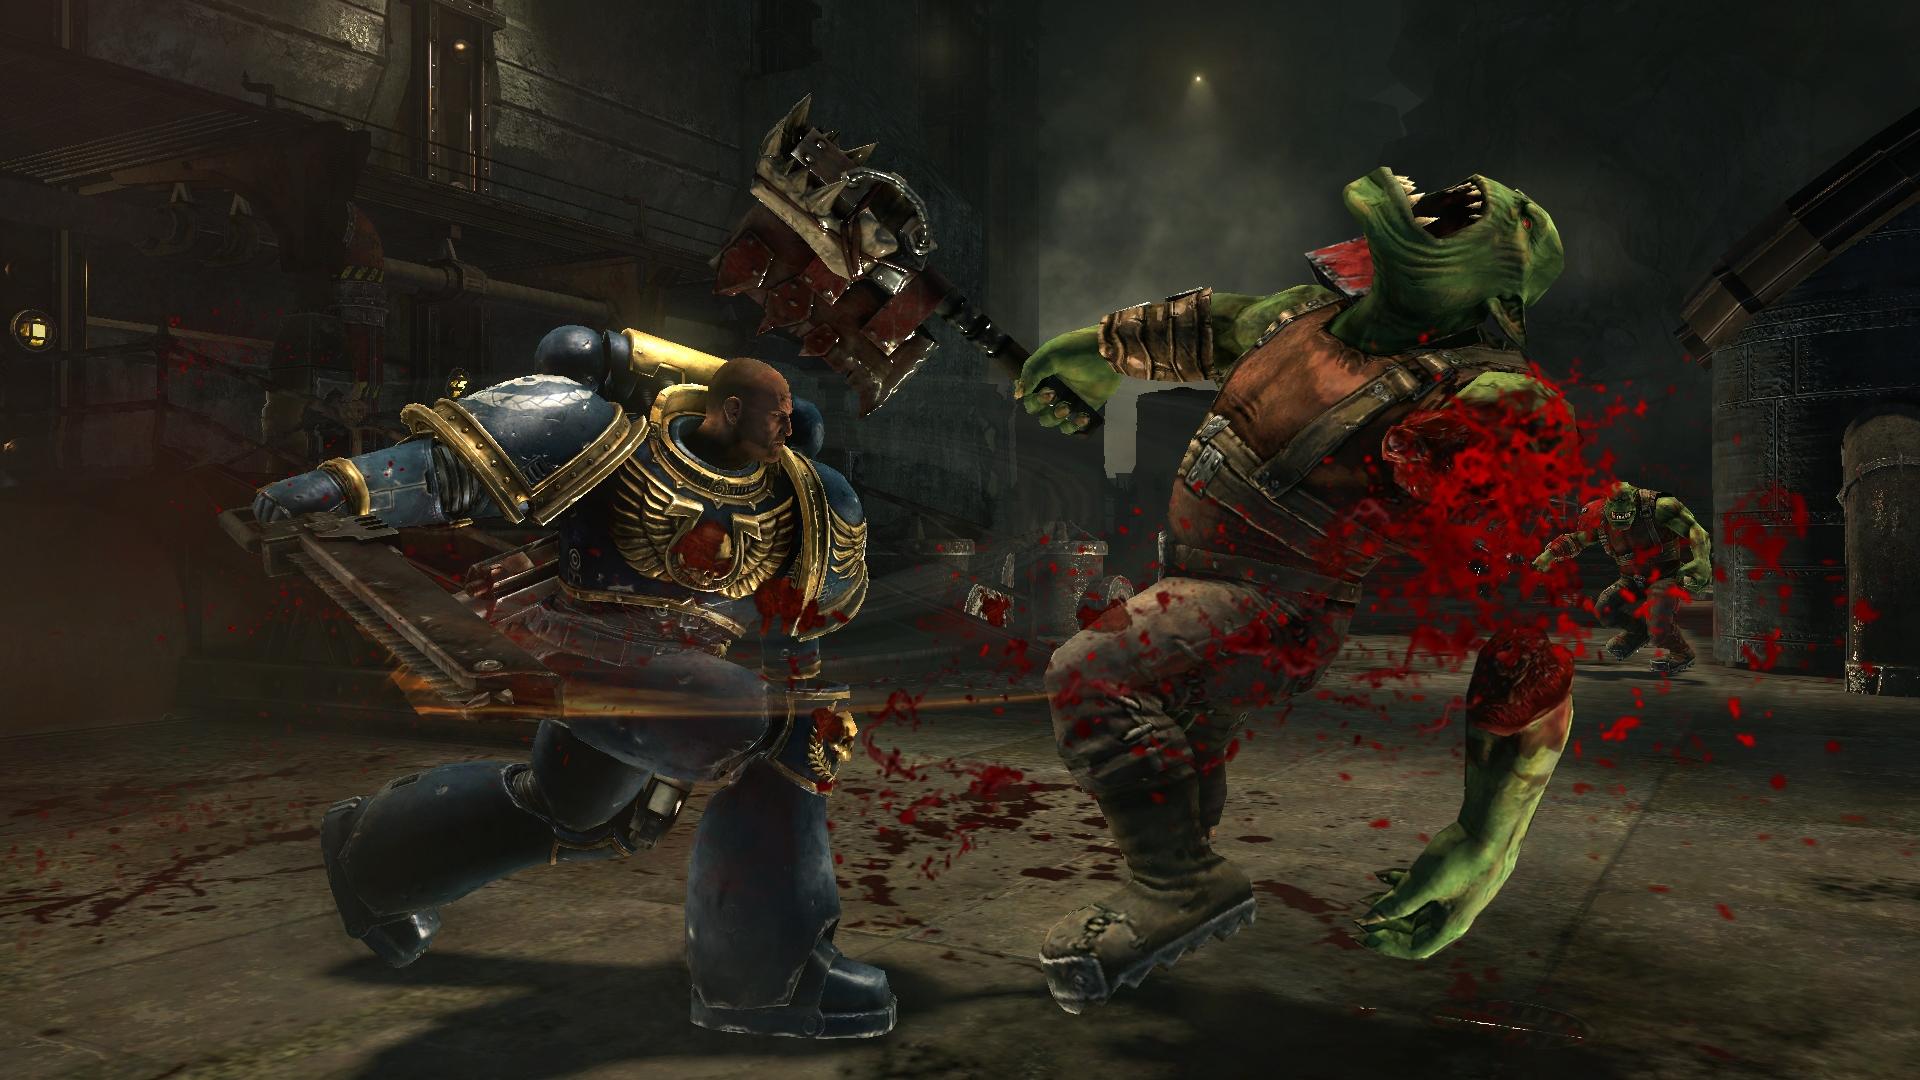 video games, futuristic, Warhammer, fantasy art, armor, artwork ...